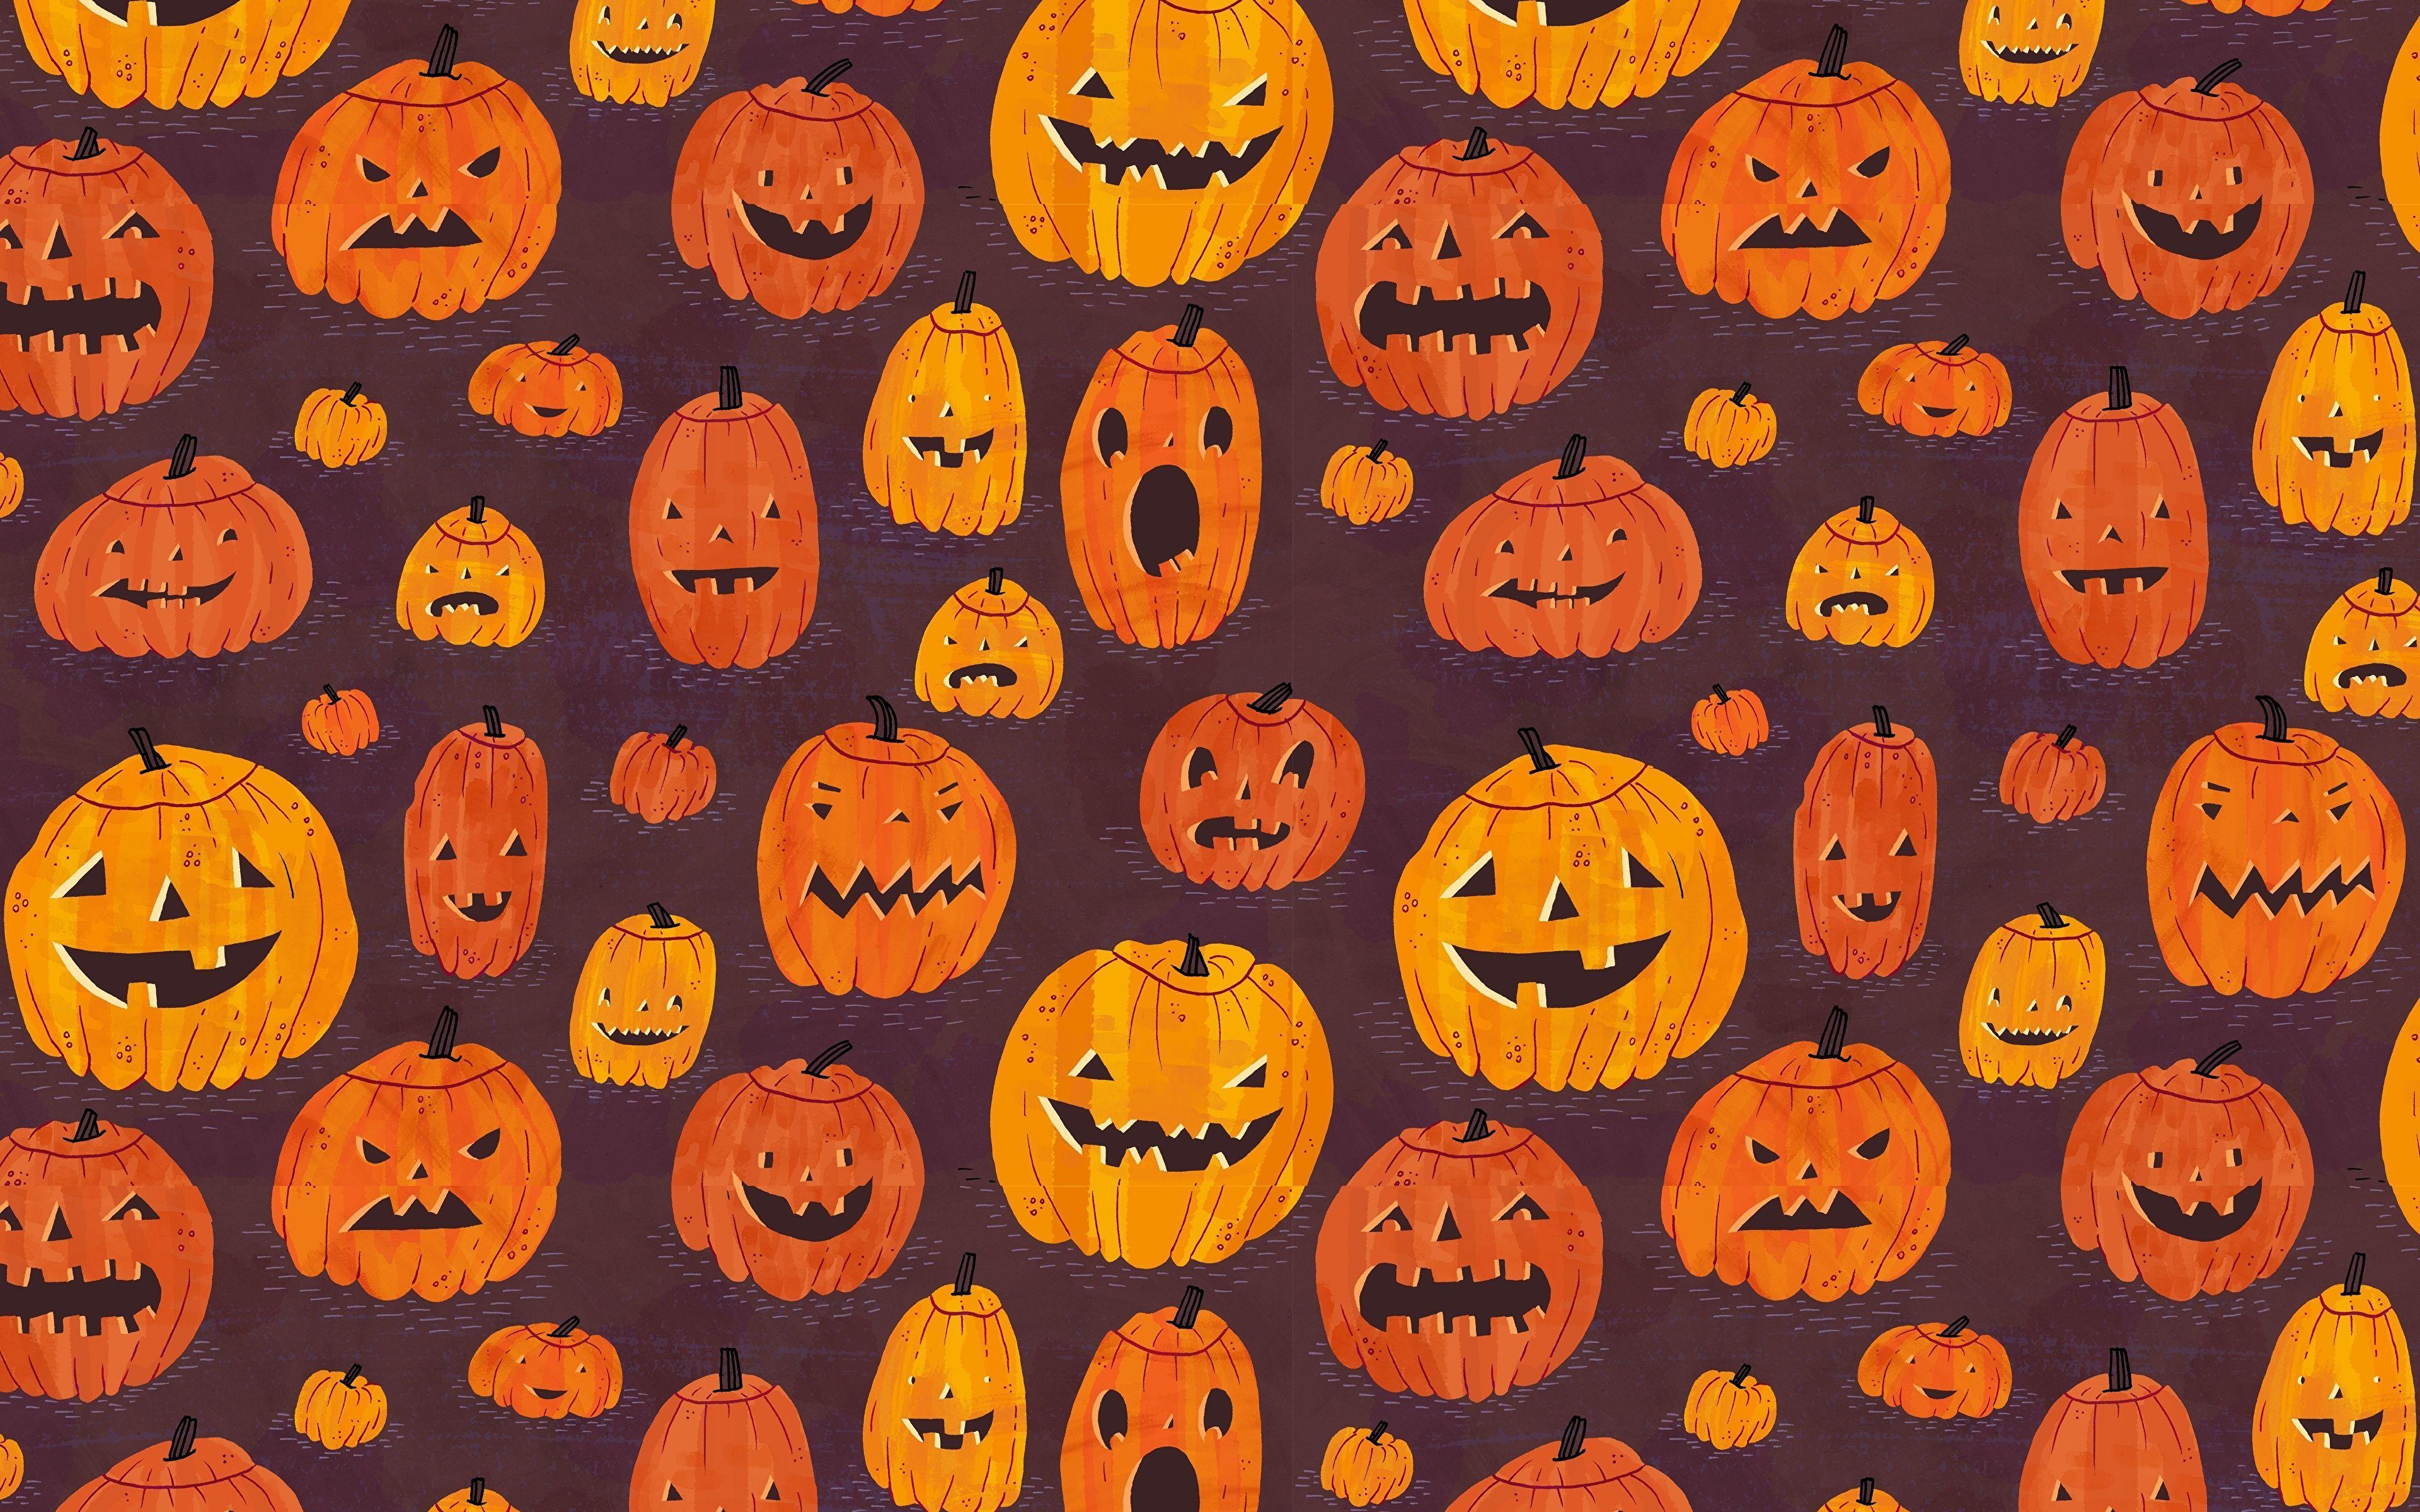 Halloween Tablet Wallpapers Top Free Halloween Tablet Backgrounds Wallpaperaccess